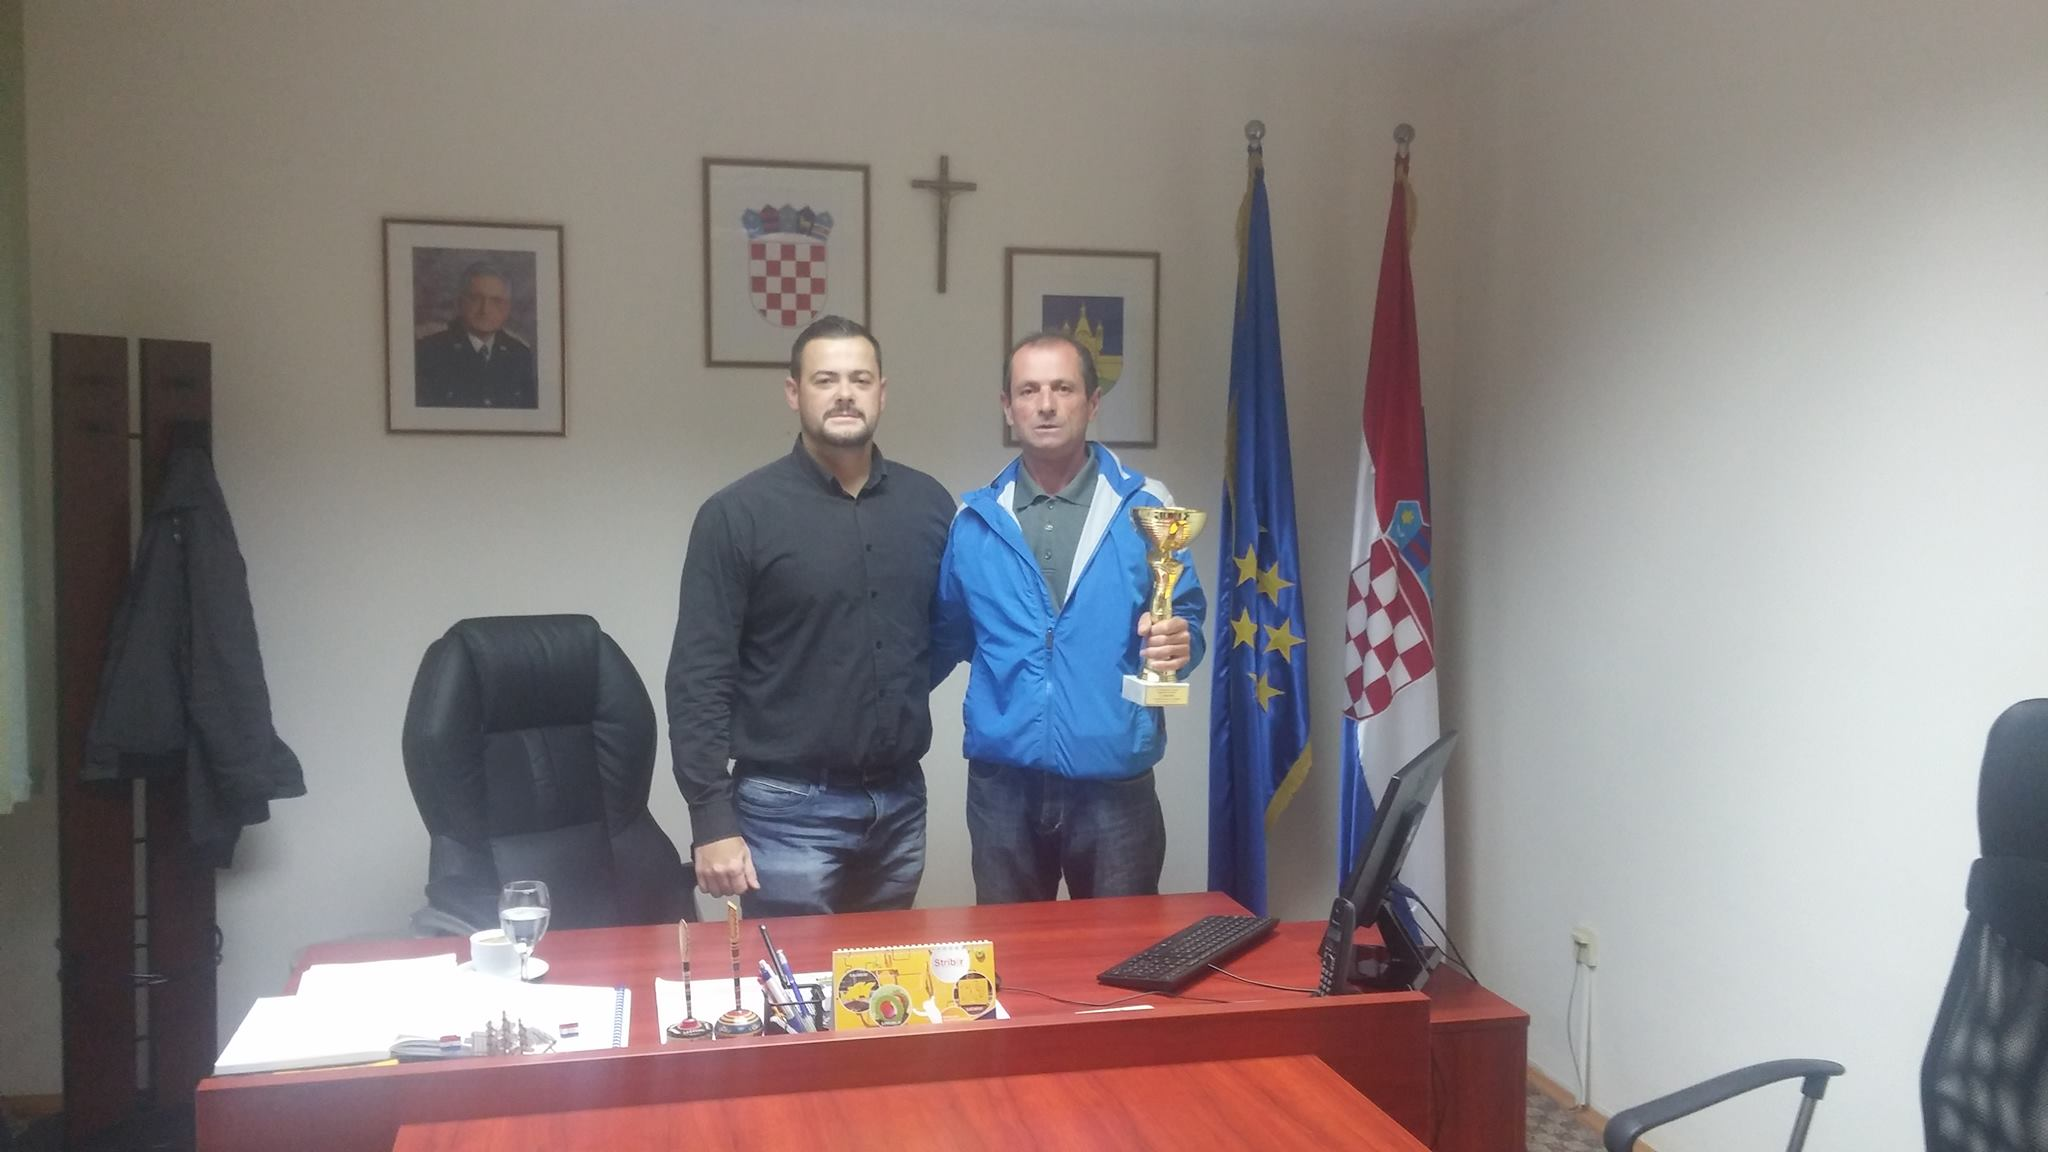 Načelnik Općine Suhopolje primio državnog prvaka Radivoja Rekića